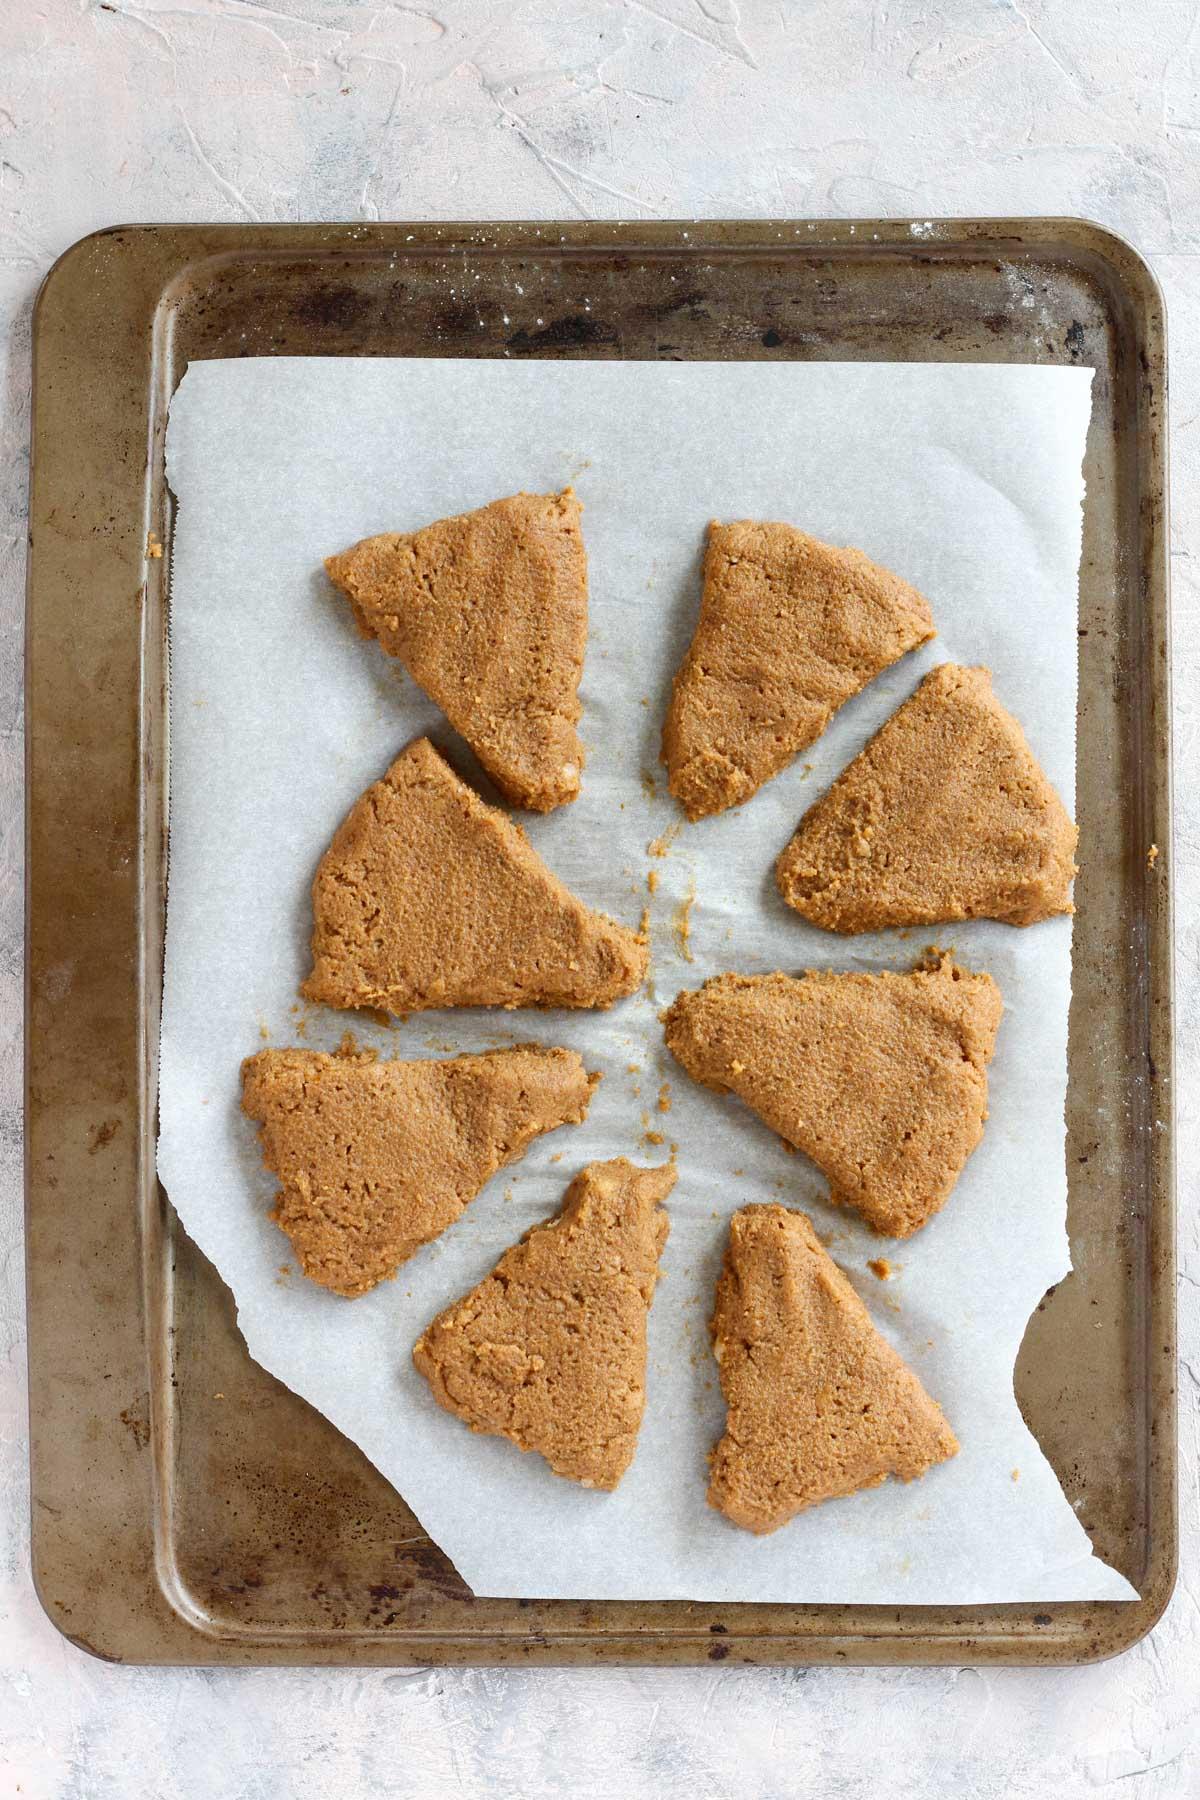 Overhead shot of uncooked scones on baking sheet.